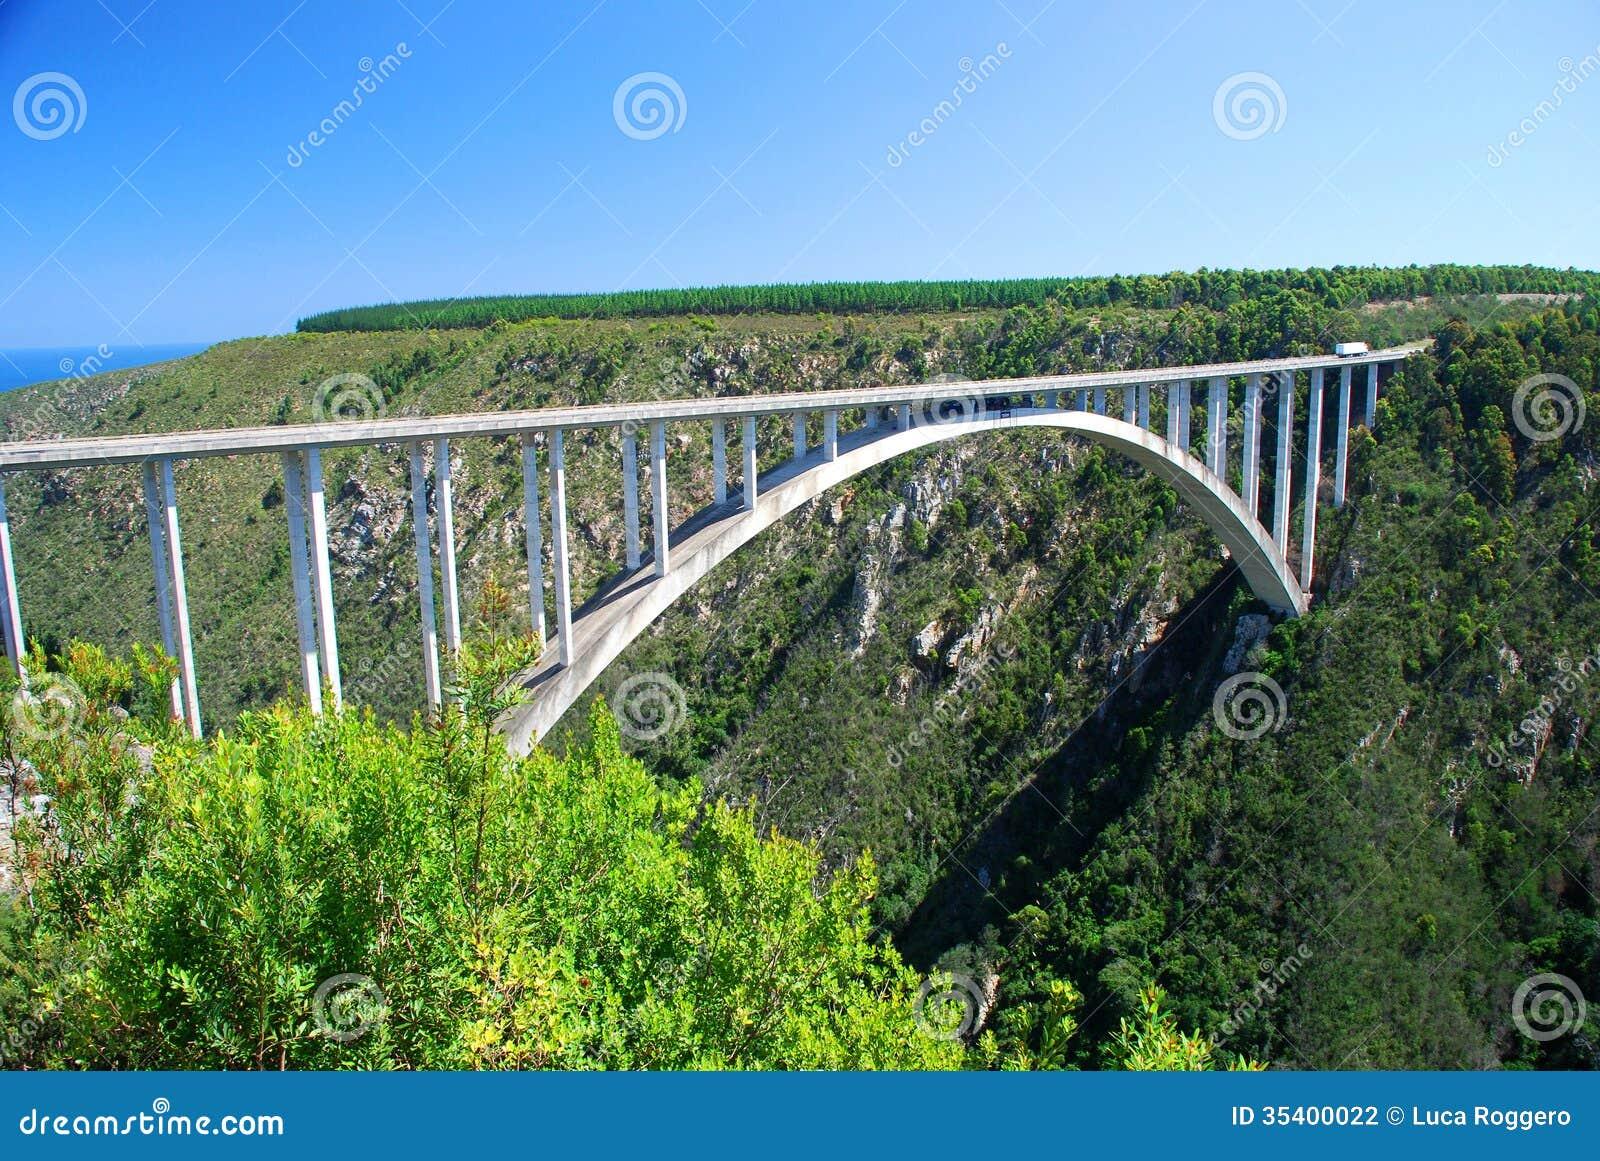 Garden Bridge Plans